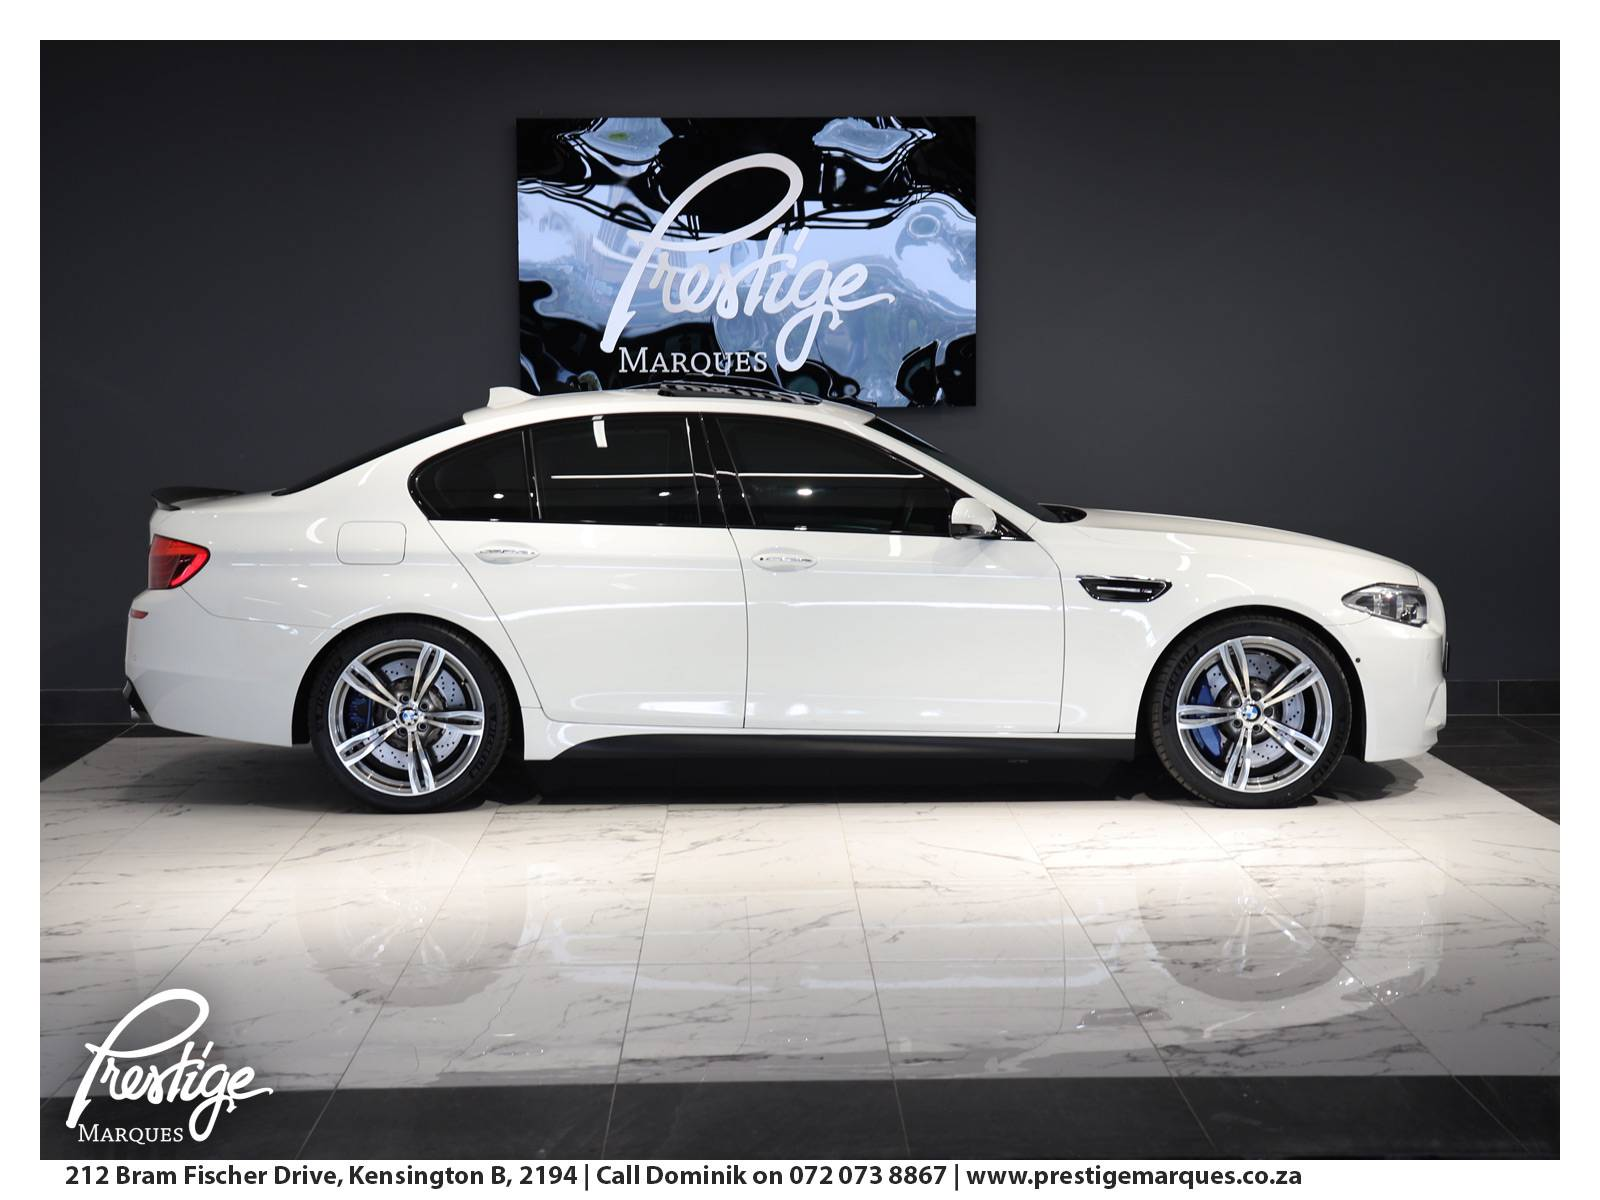 2015-BMW-F10-M5-MDCT-Prestige-Marques-Randburg-Sandton-2